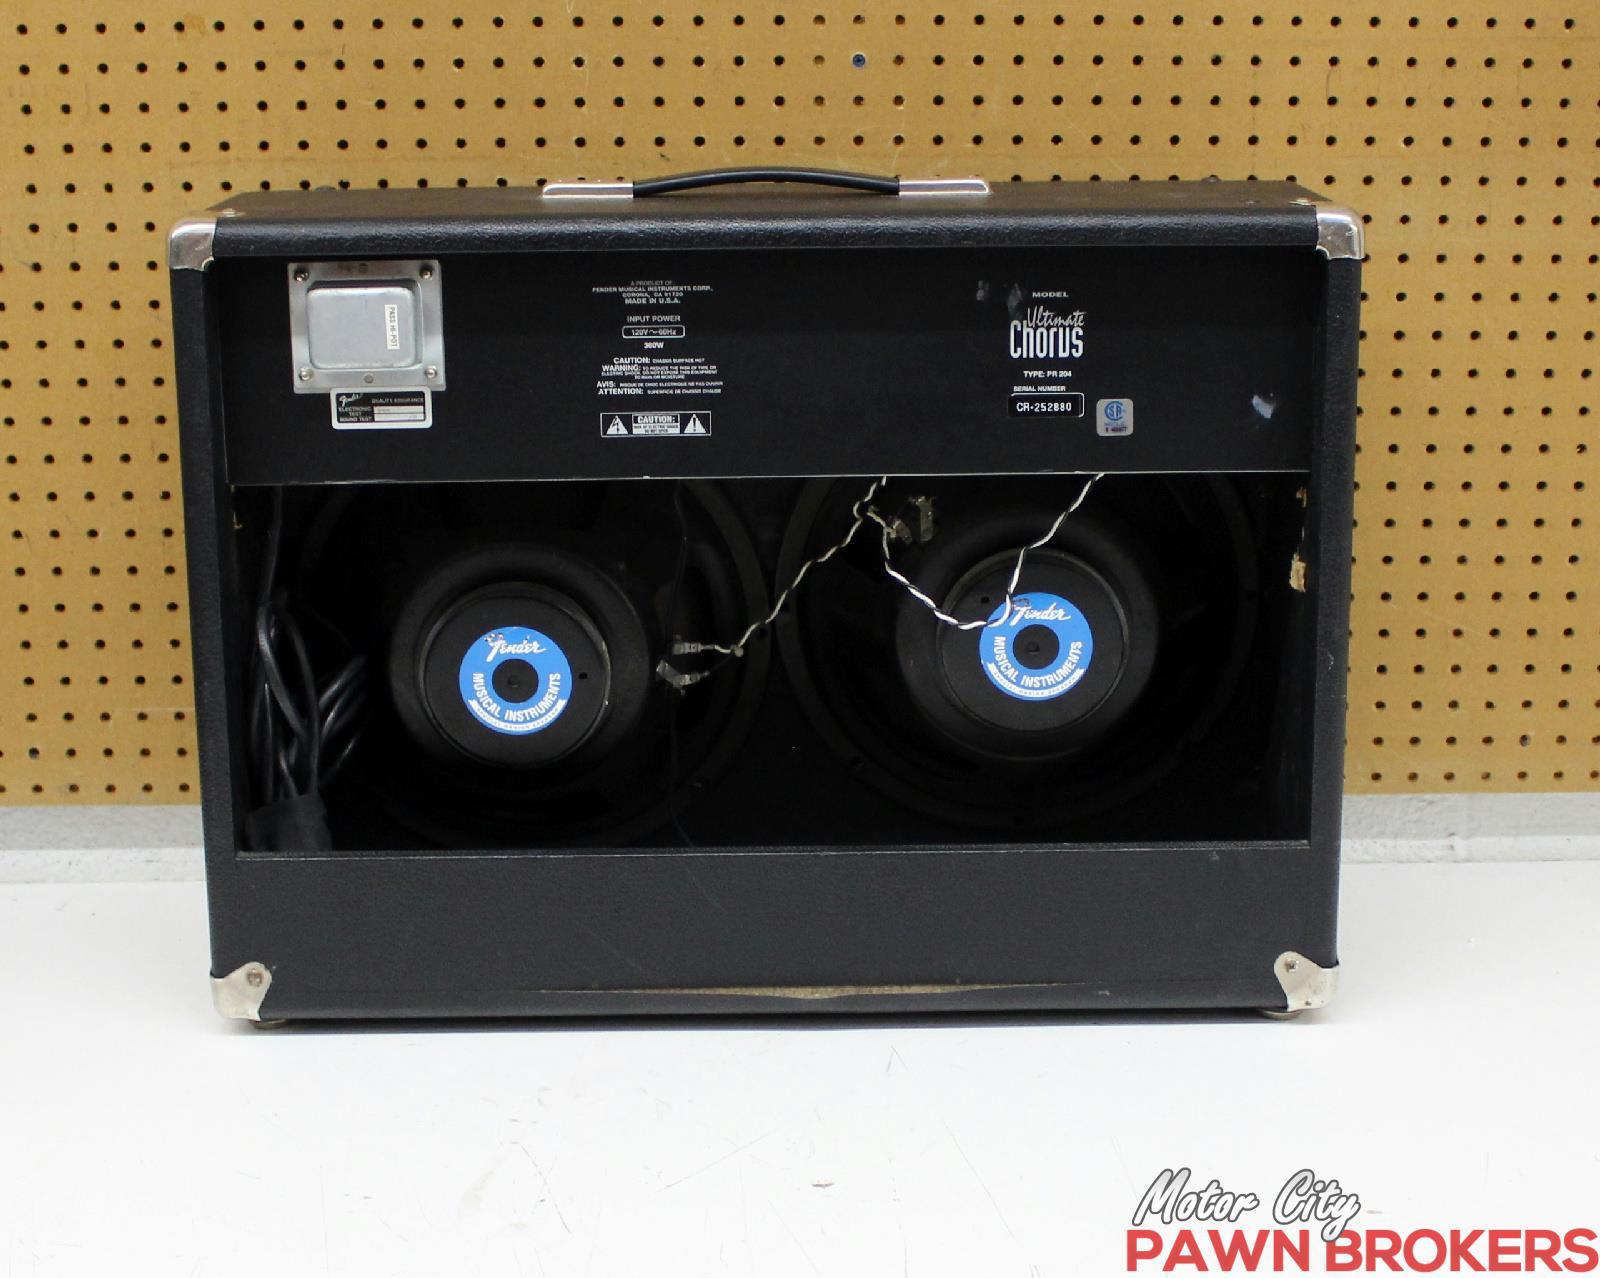 fender ultimate chorus 130w 2 x 12 electric guitar combo amplifier. Black Bedroom Furniture Sets. Home Design Ideas